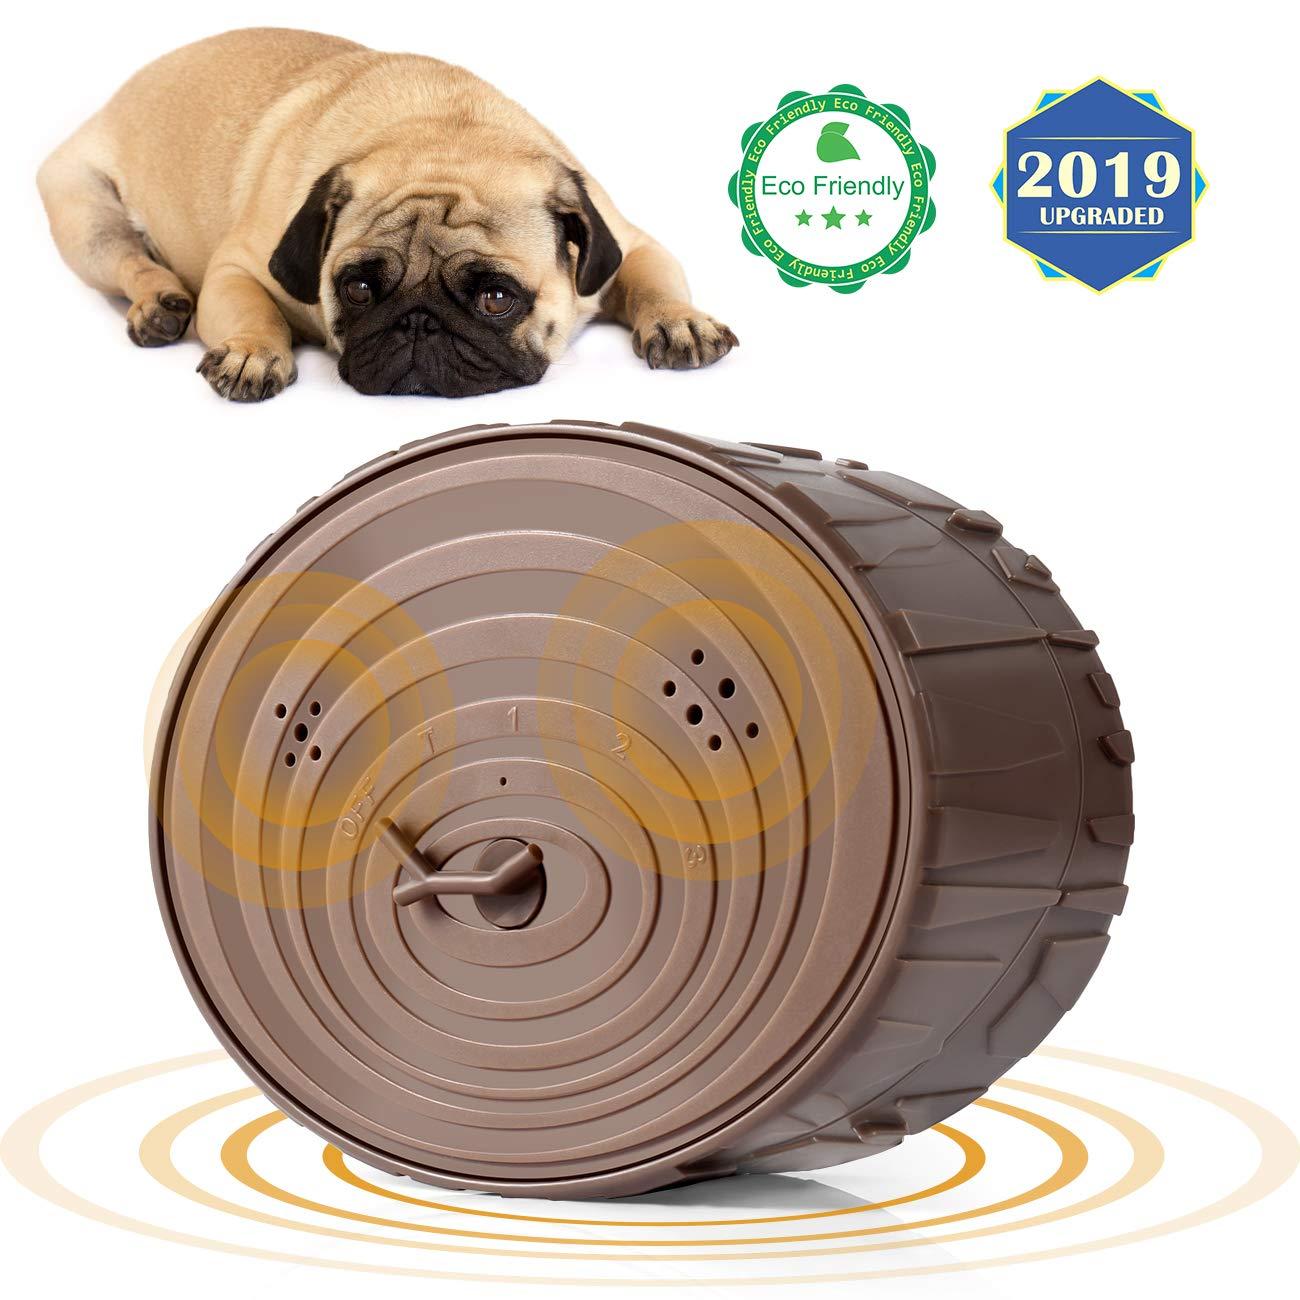 Lambow Anti Barking Device, Ultrasonic Dog Bark Control Sonic Bark Deterrents Silencer Stop Barking Bark Stop Repeller